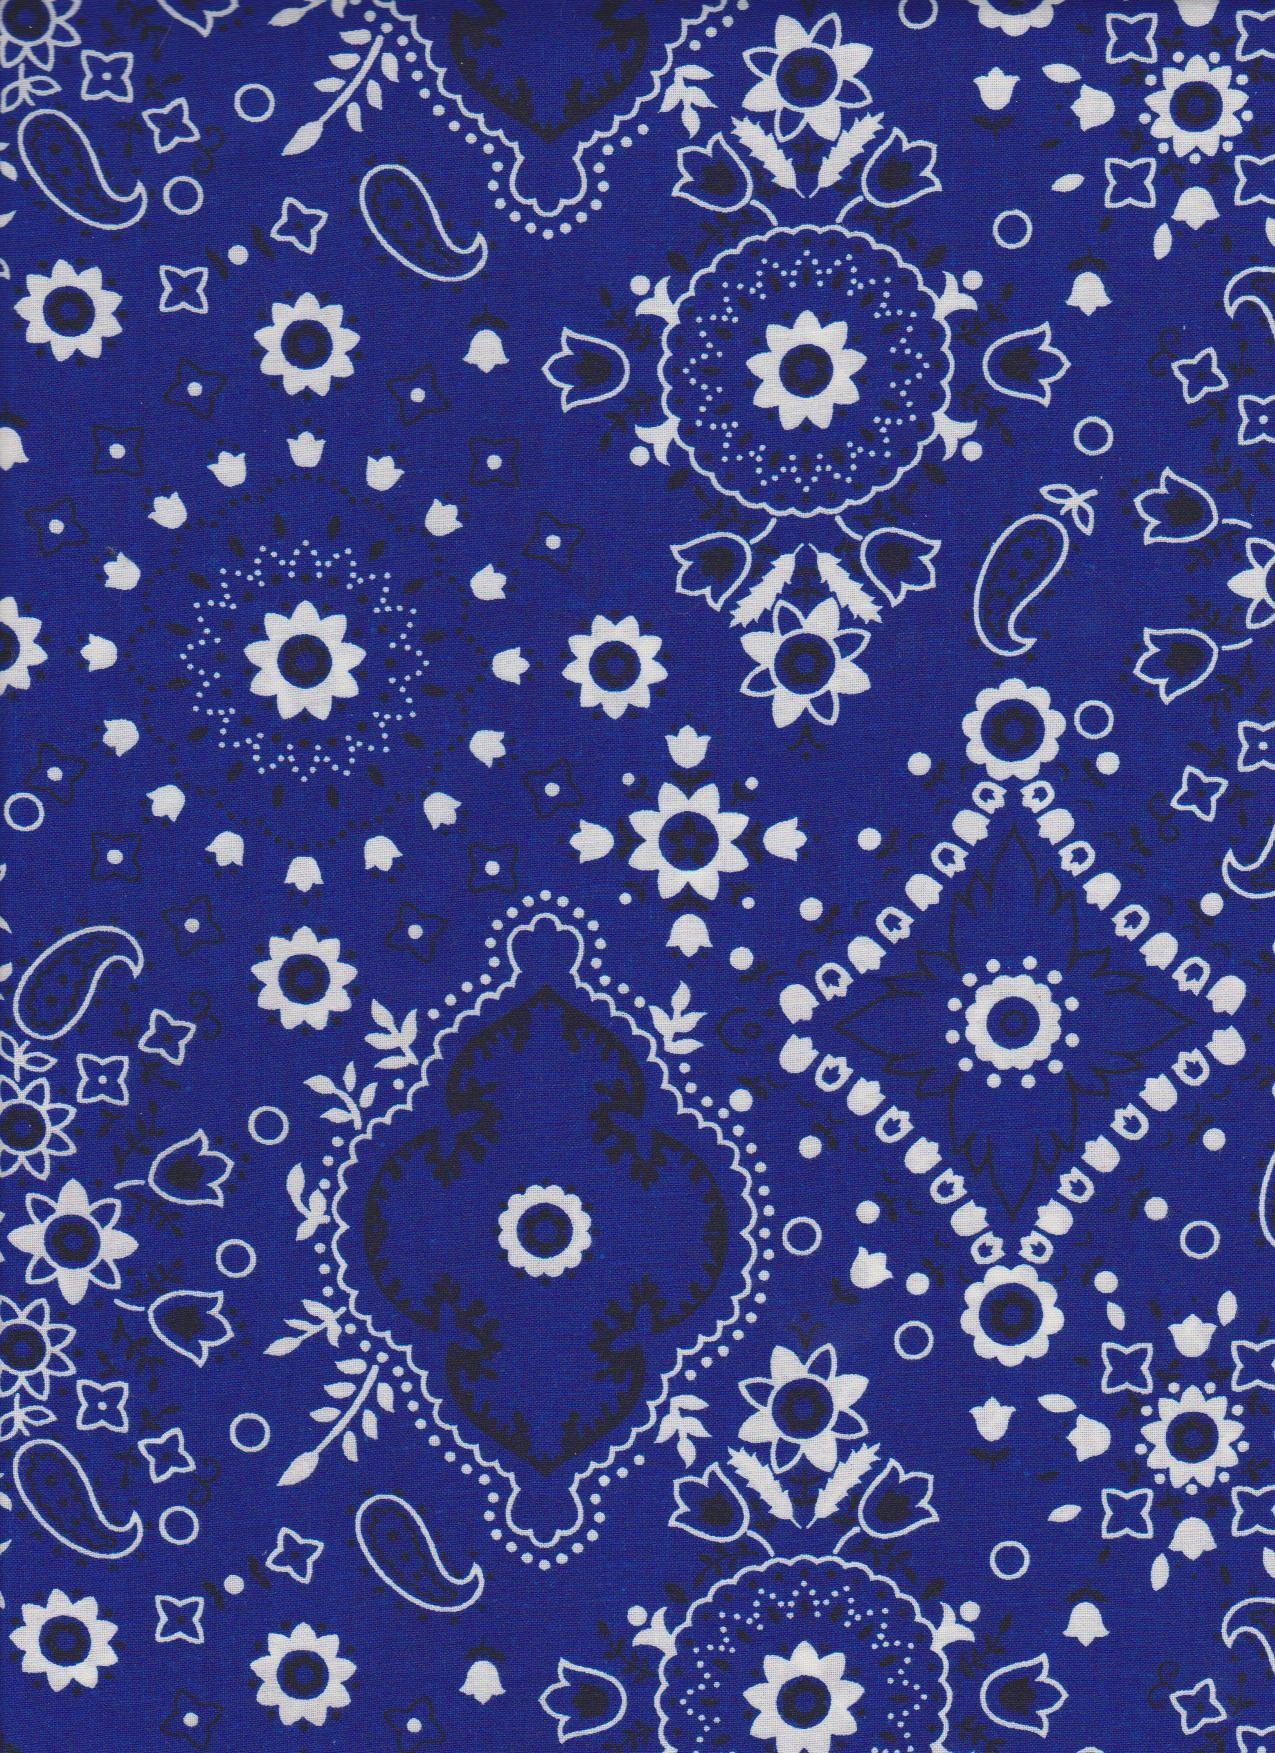 Bandana Wallpaper - Blue Bandana Wallpaper Phone , HD Wallpaper & Backgrounds